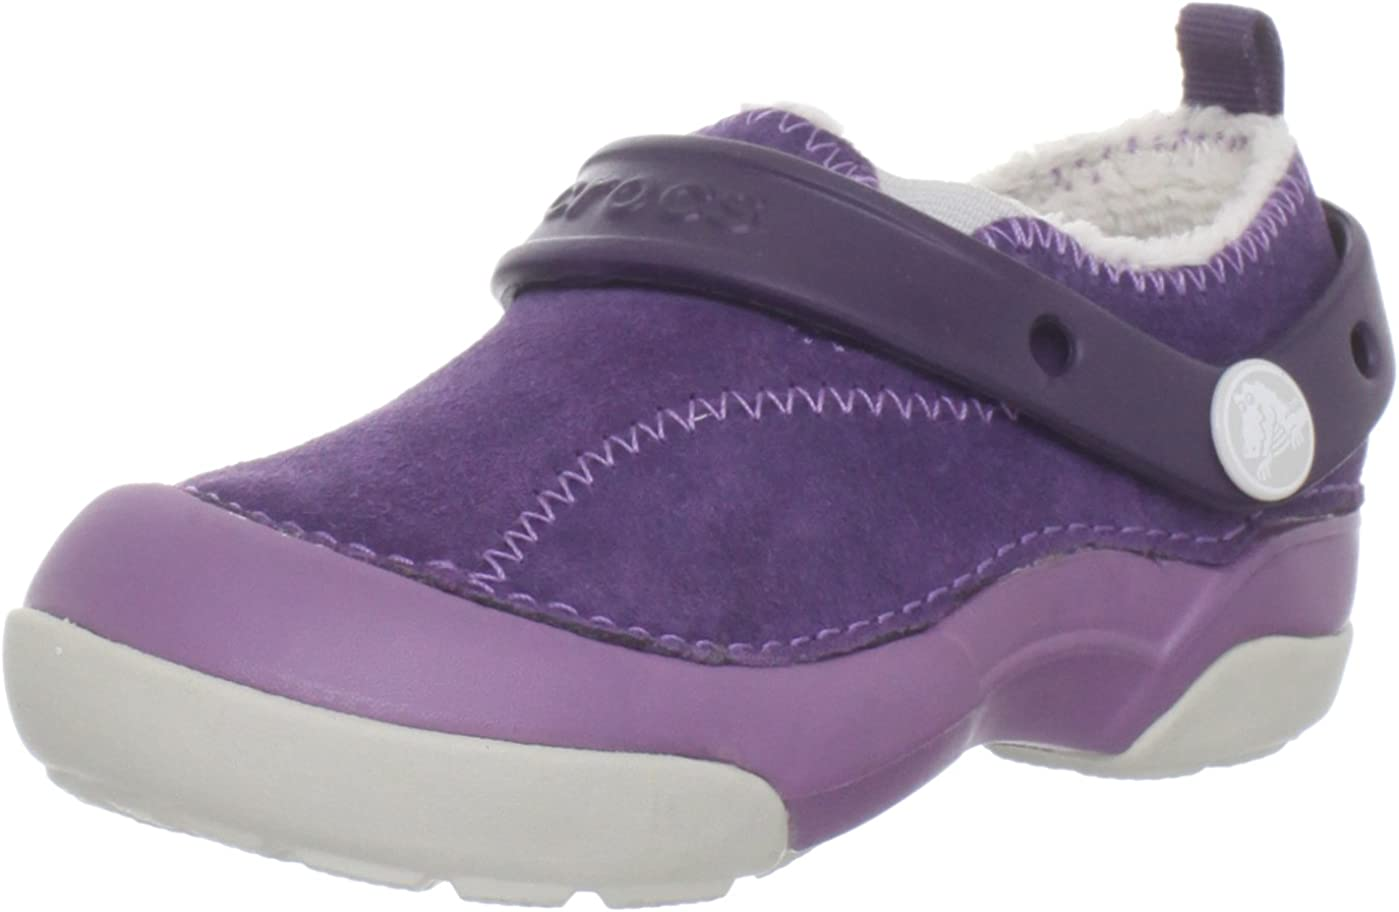 Crocs Kids' Dawson Shoe